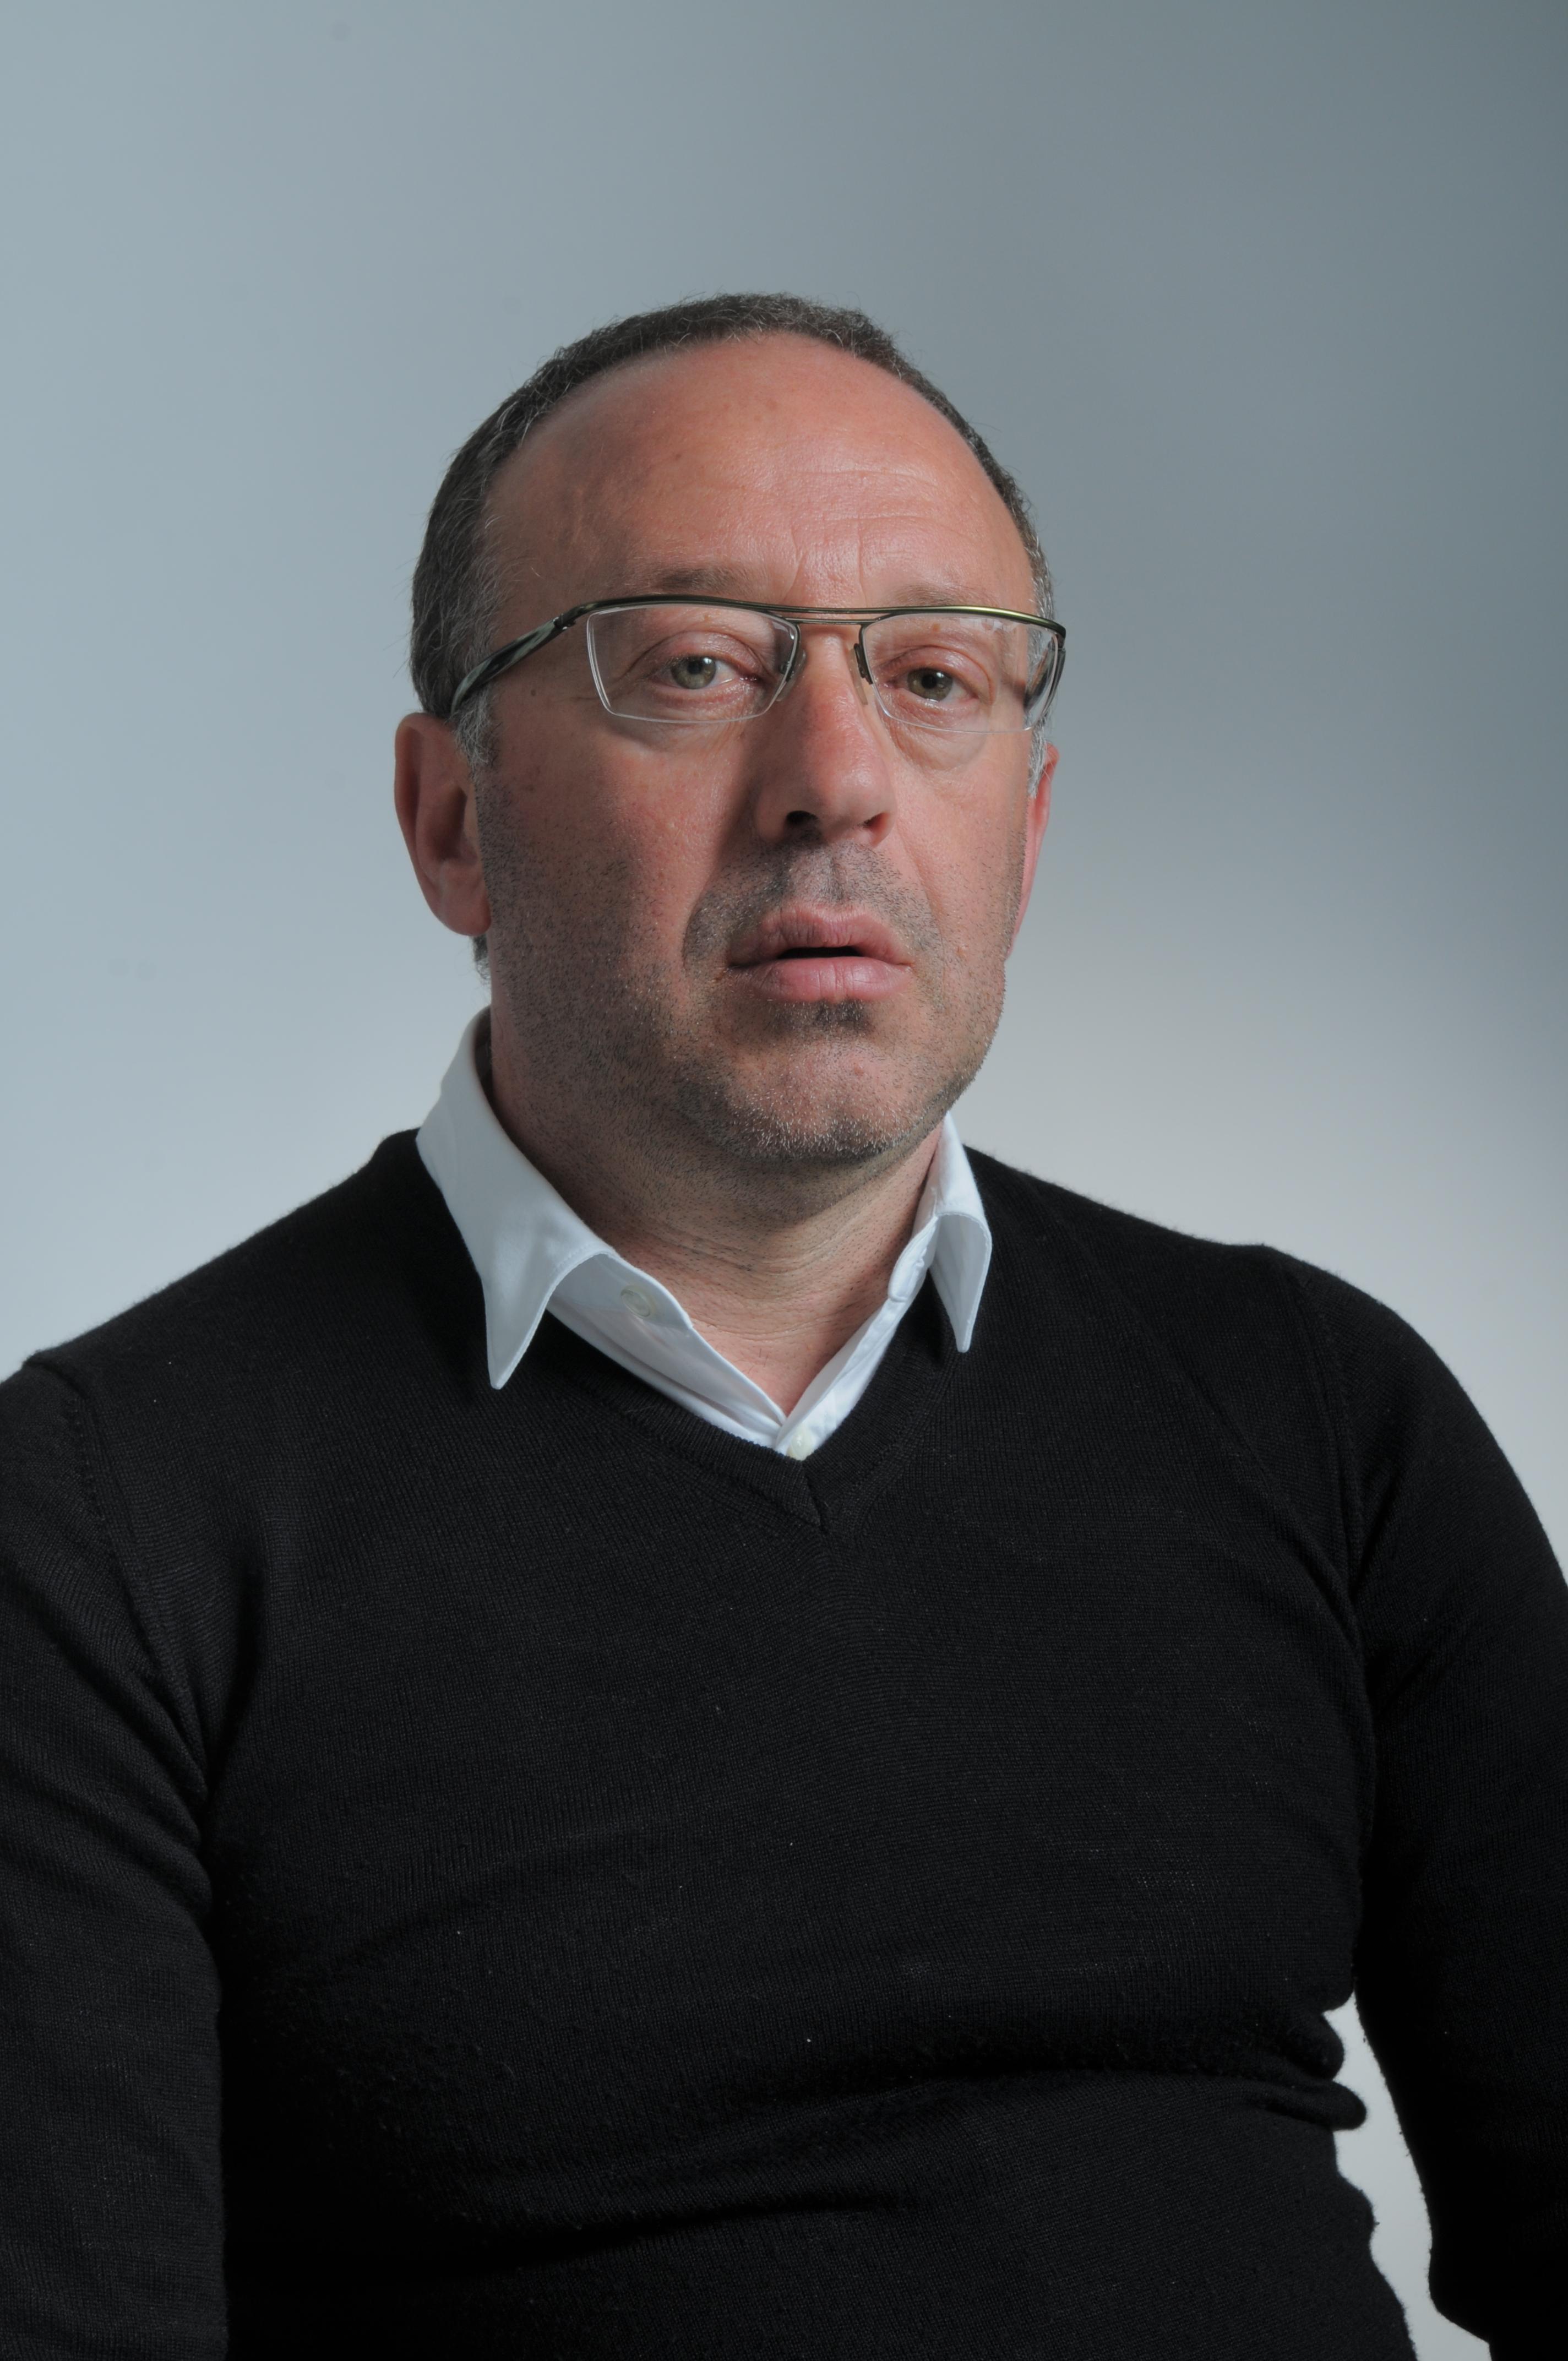 VALDIMIRO ORSINI - Consigliere Terni